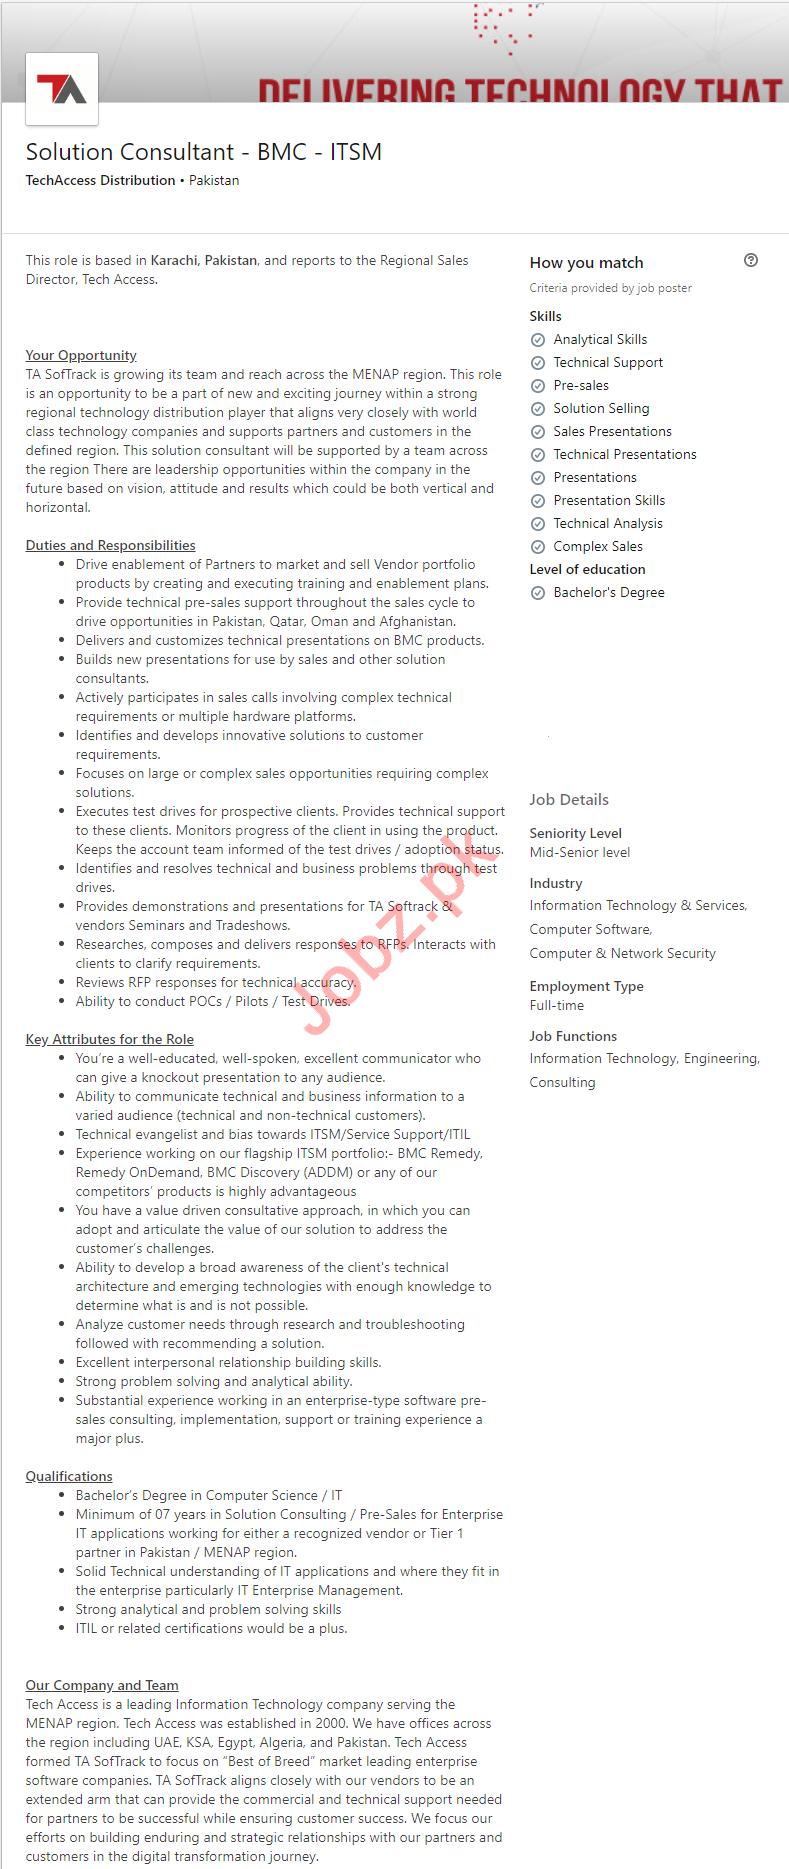 Solution Consultant Job 2019 For Karachi